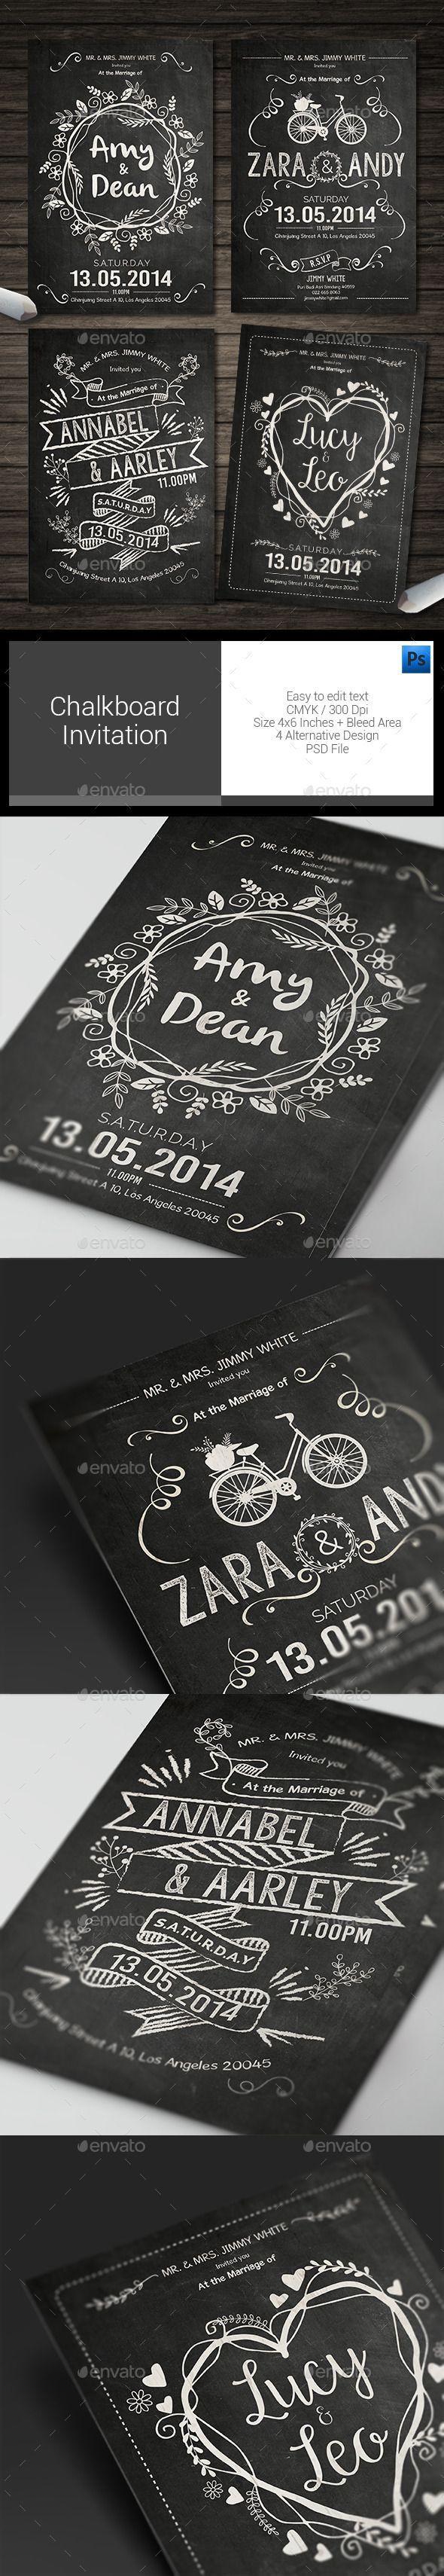 wedding invitation templates in telugu%0A Chalkboard Invitation Template  design Download   http   graphicriver net item